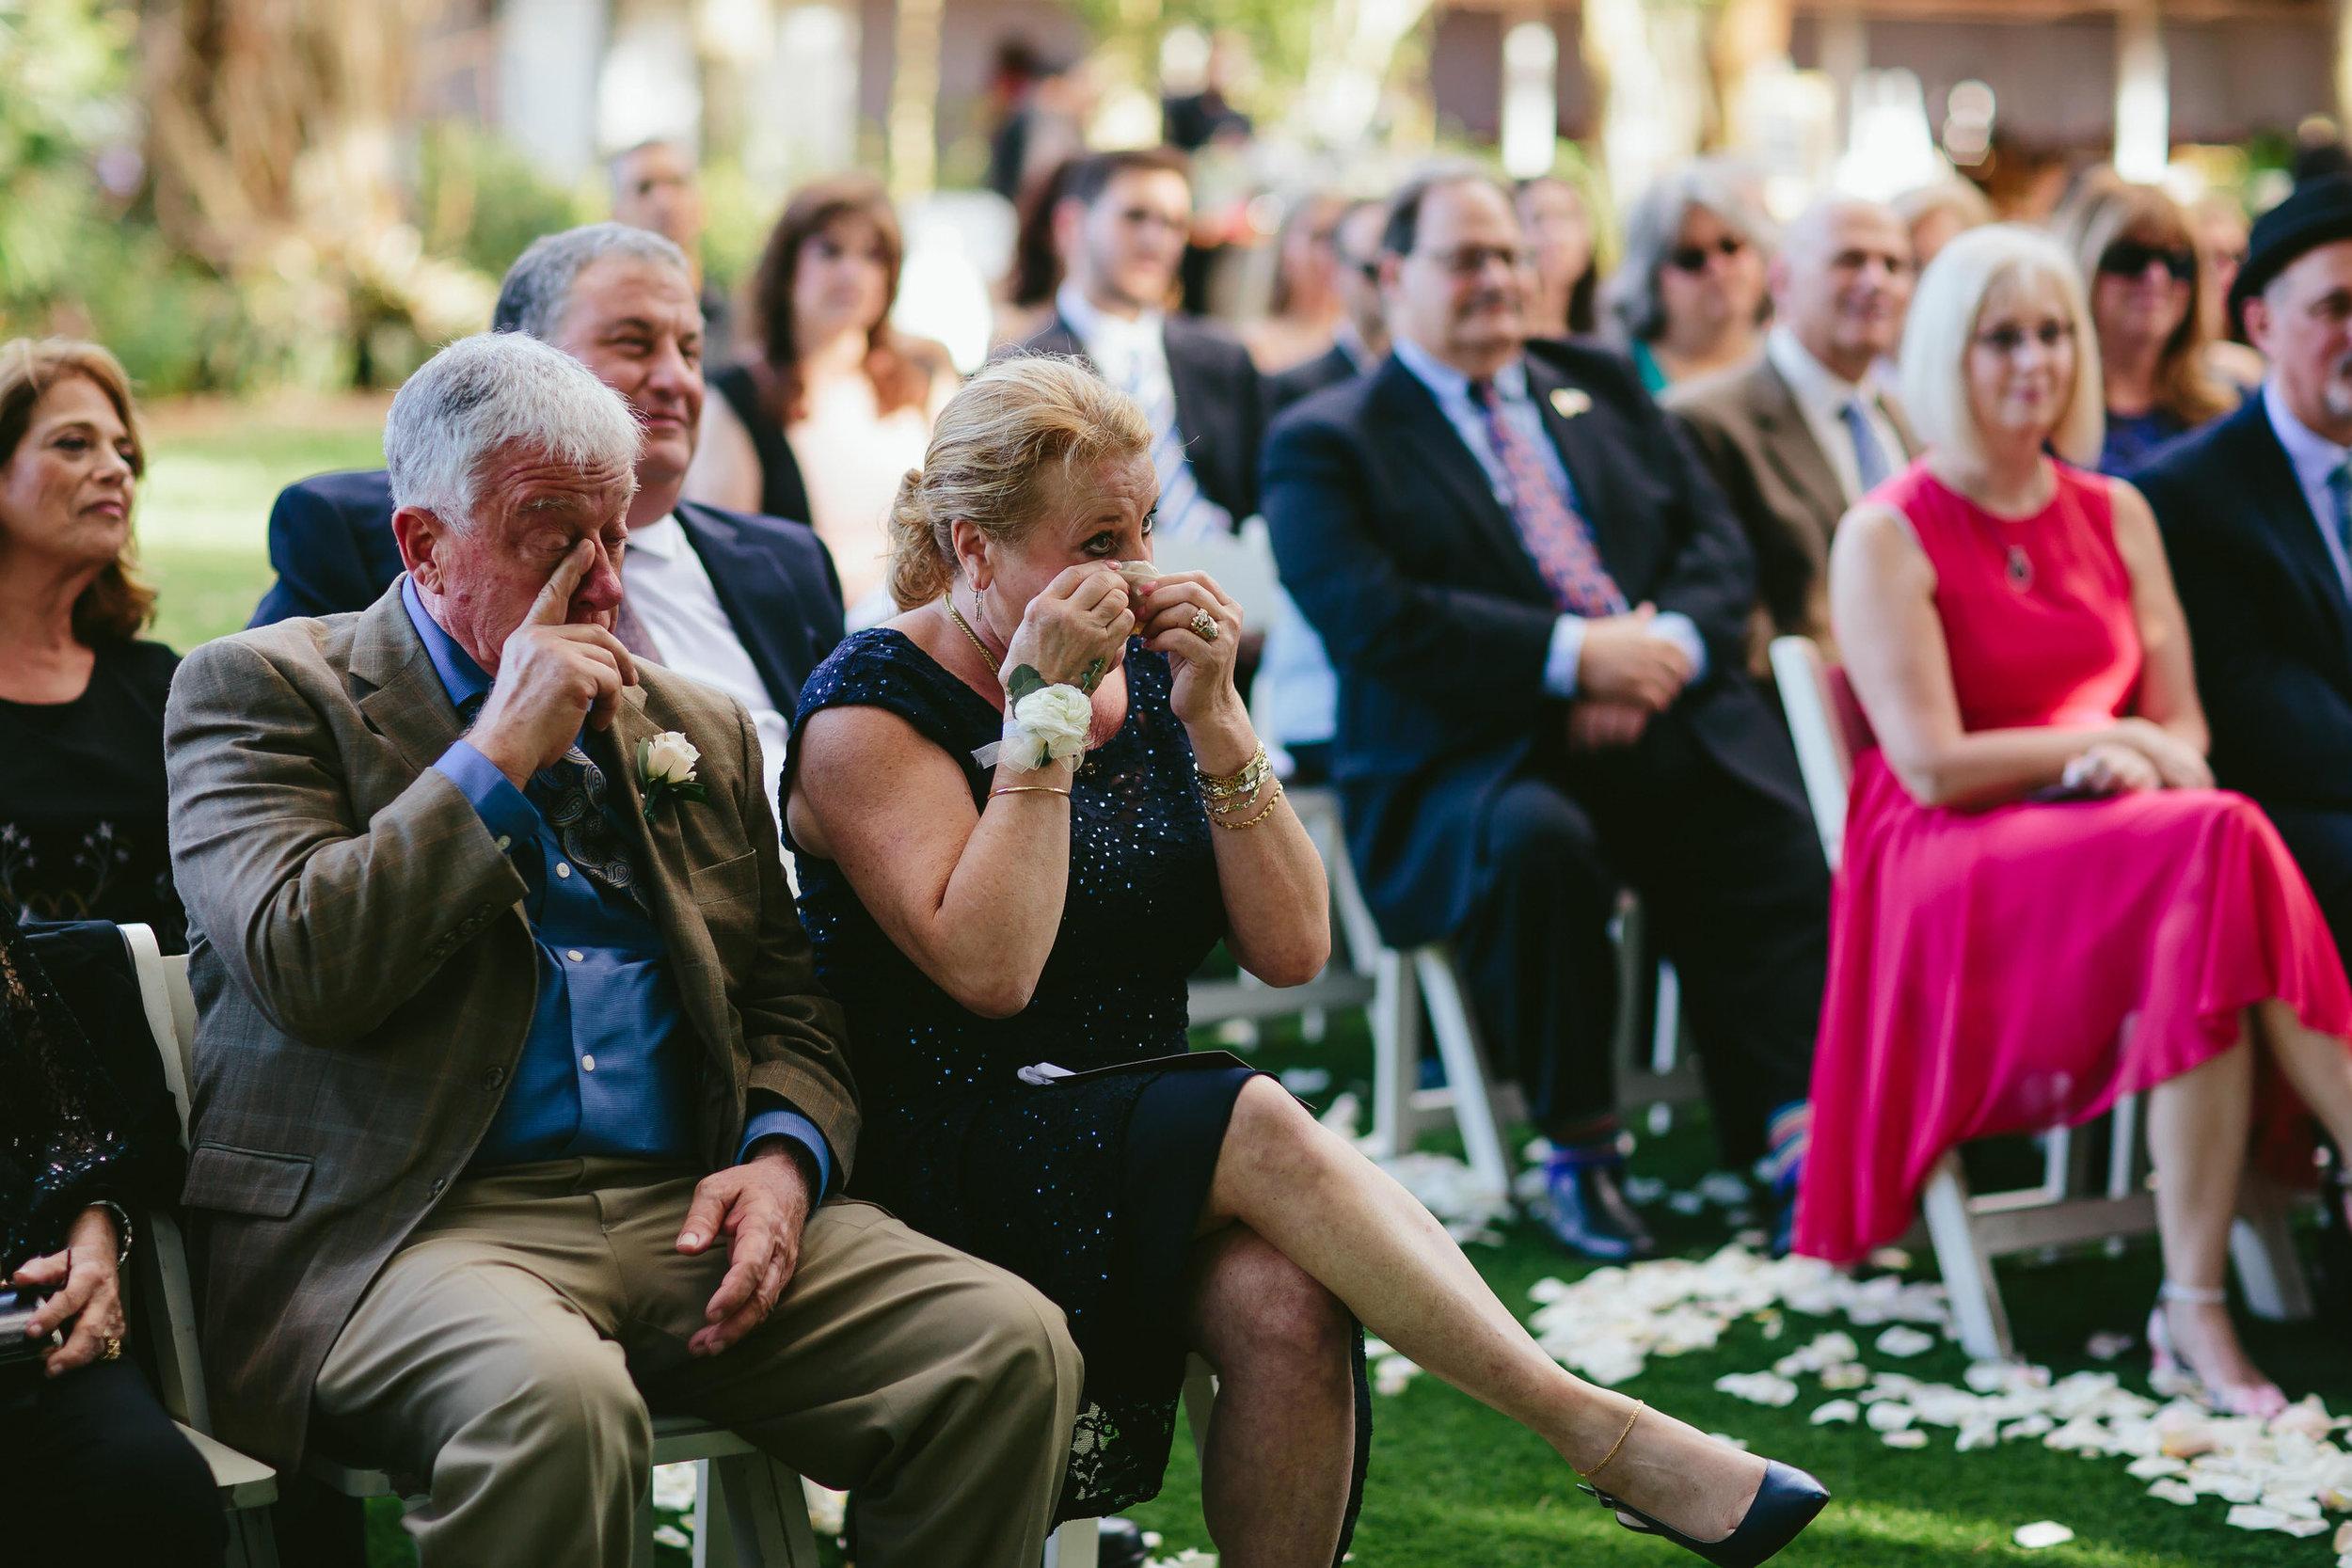 emotional-wedding-photography-moments-tiny-house-photo-south-florida.jpg